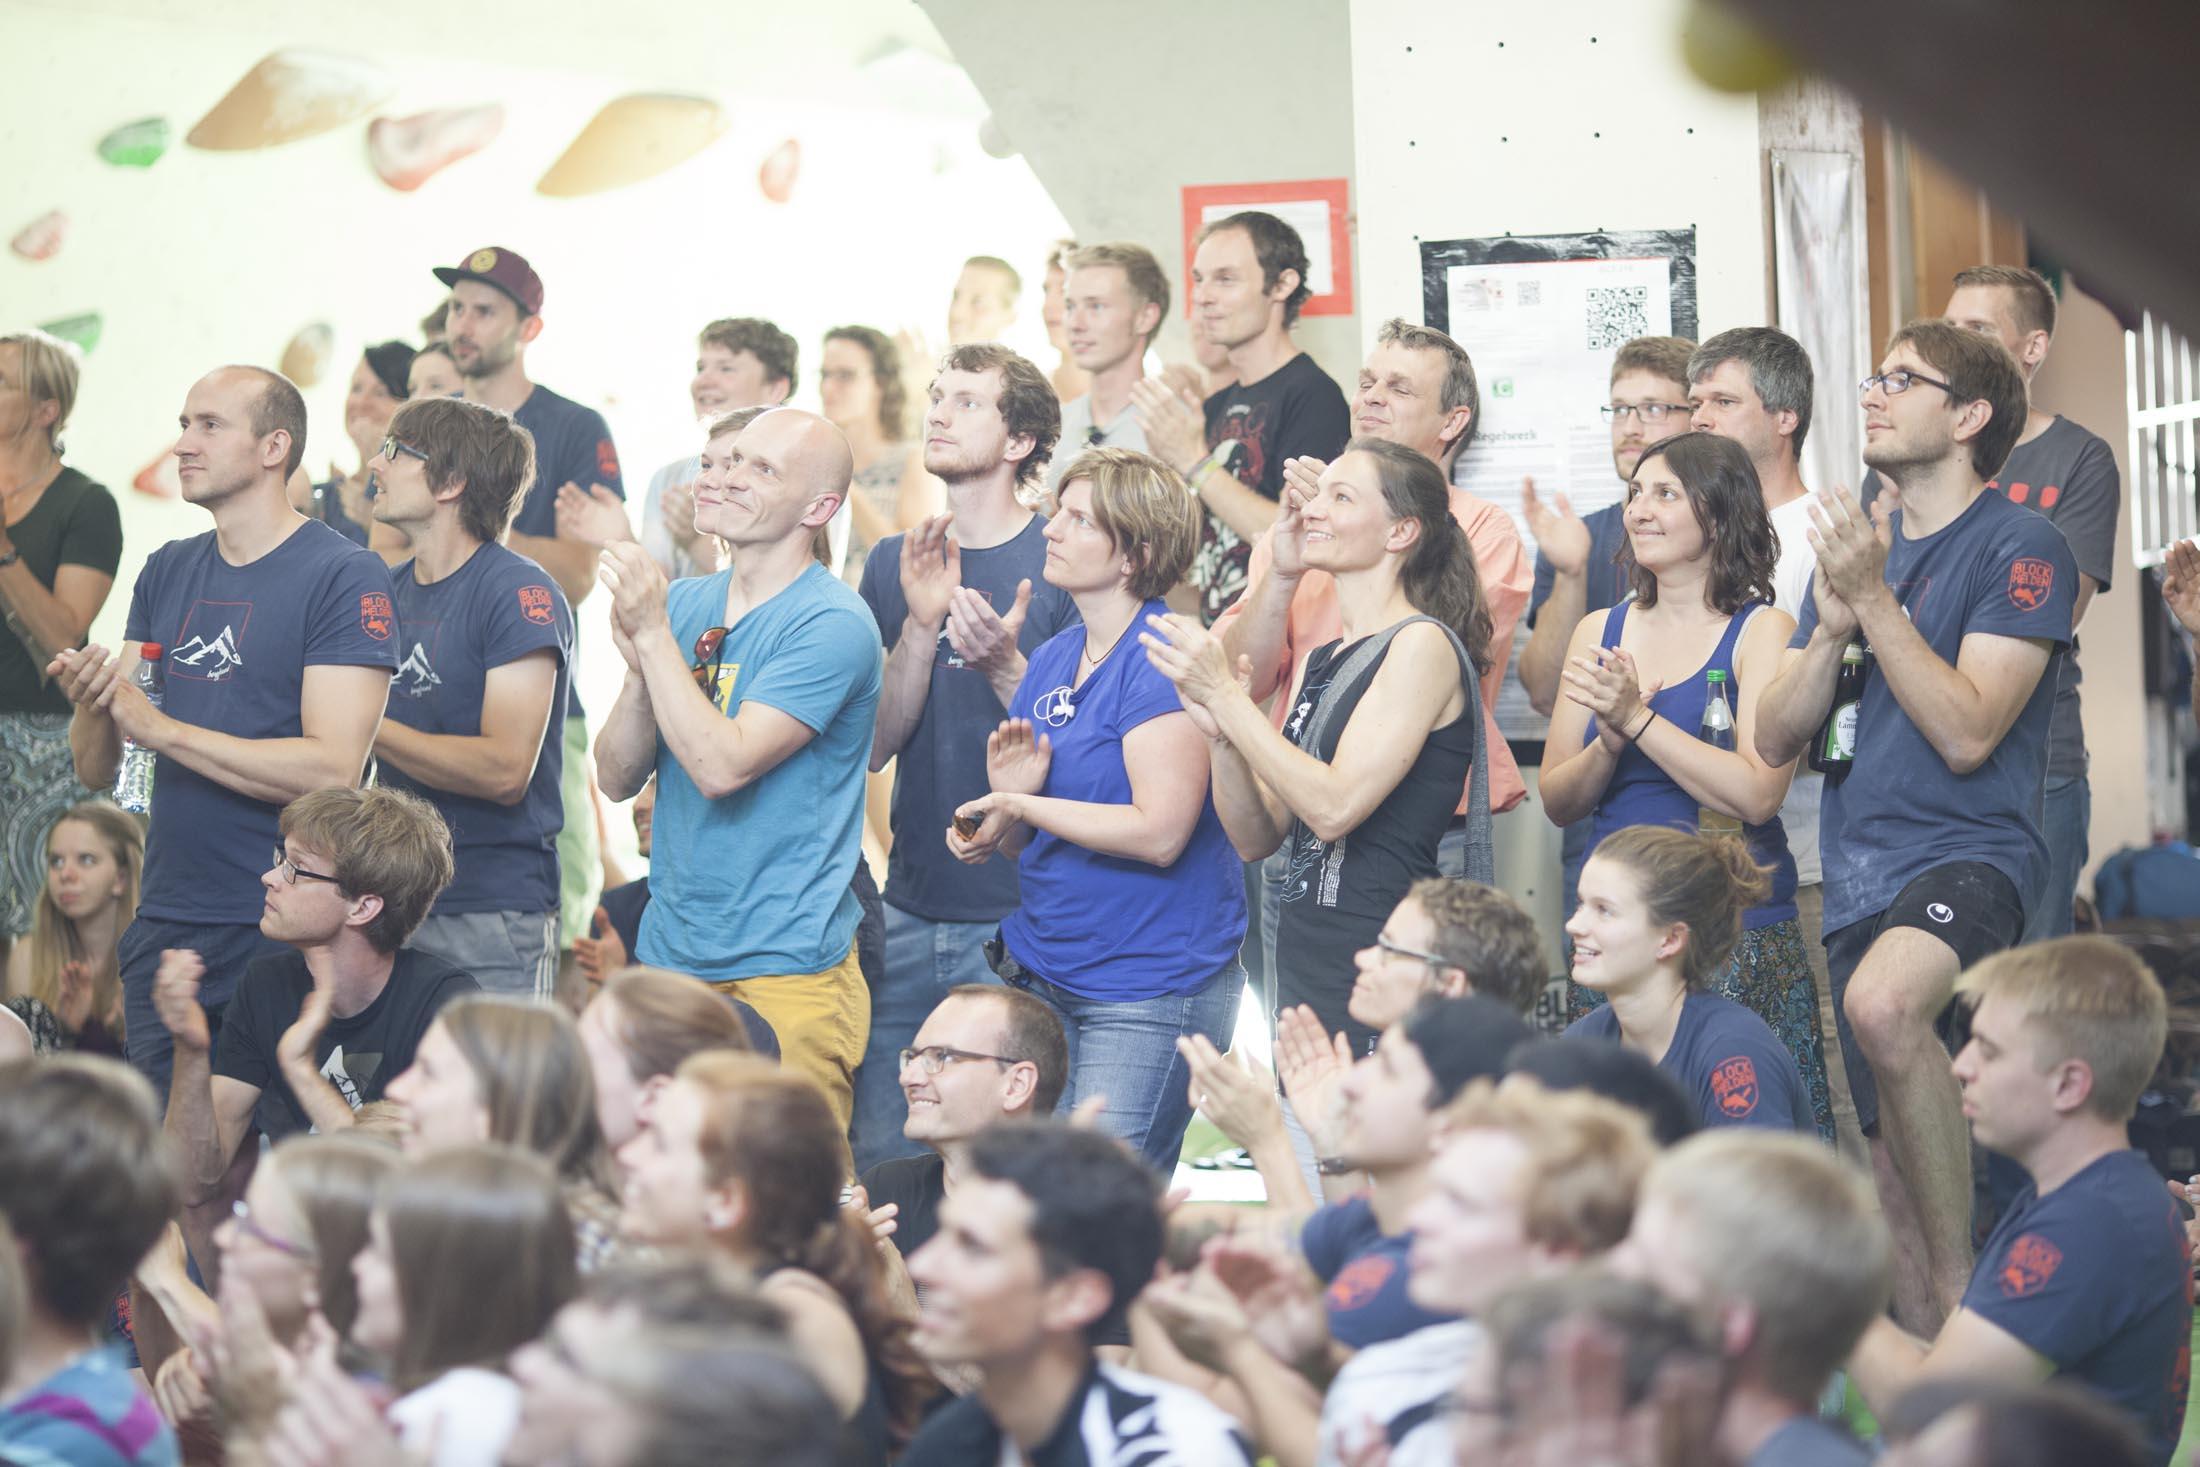 Finale, internationaler bouldercup Frankenjura 2016, BLOCKHELDEN Erlangen, Mammut, Bergfreunde.de, Boulderwettkampf07092016628